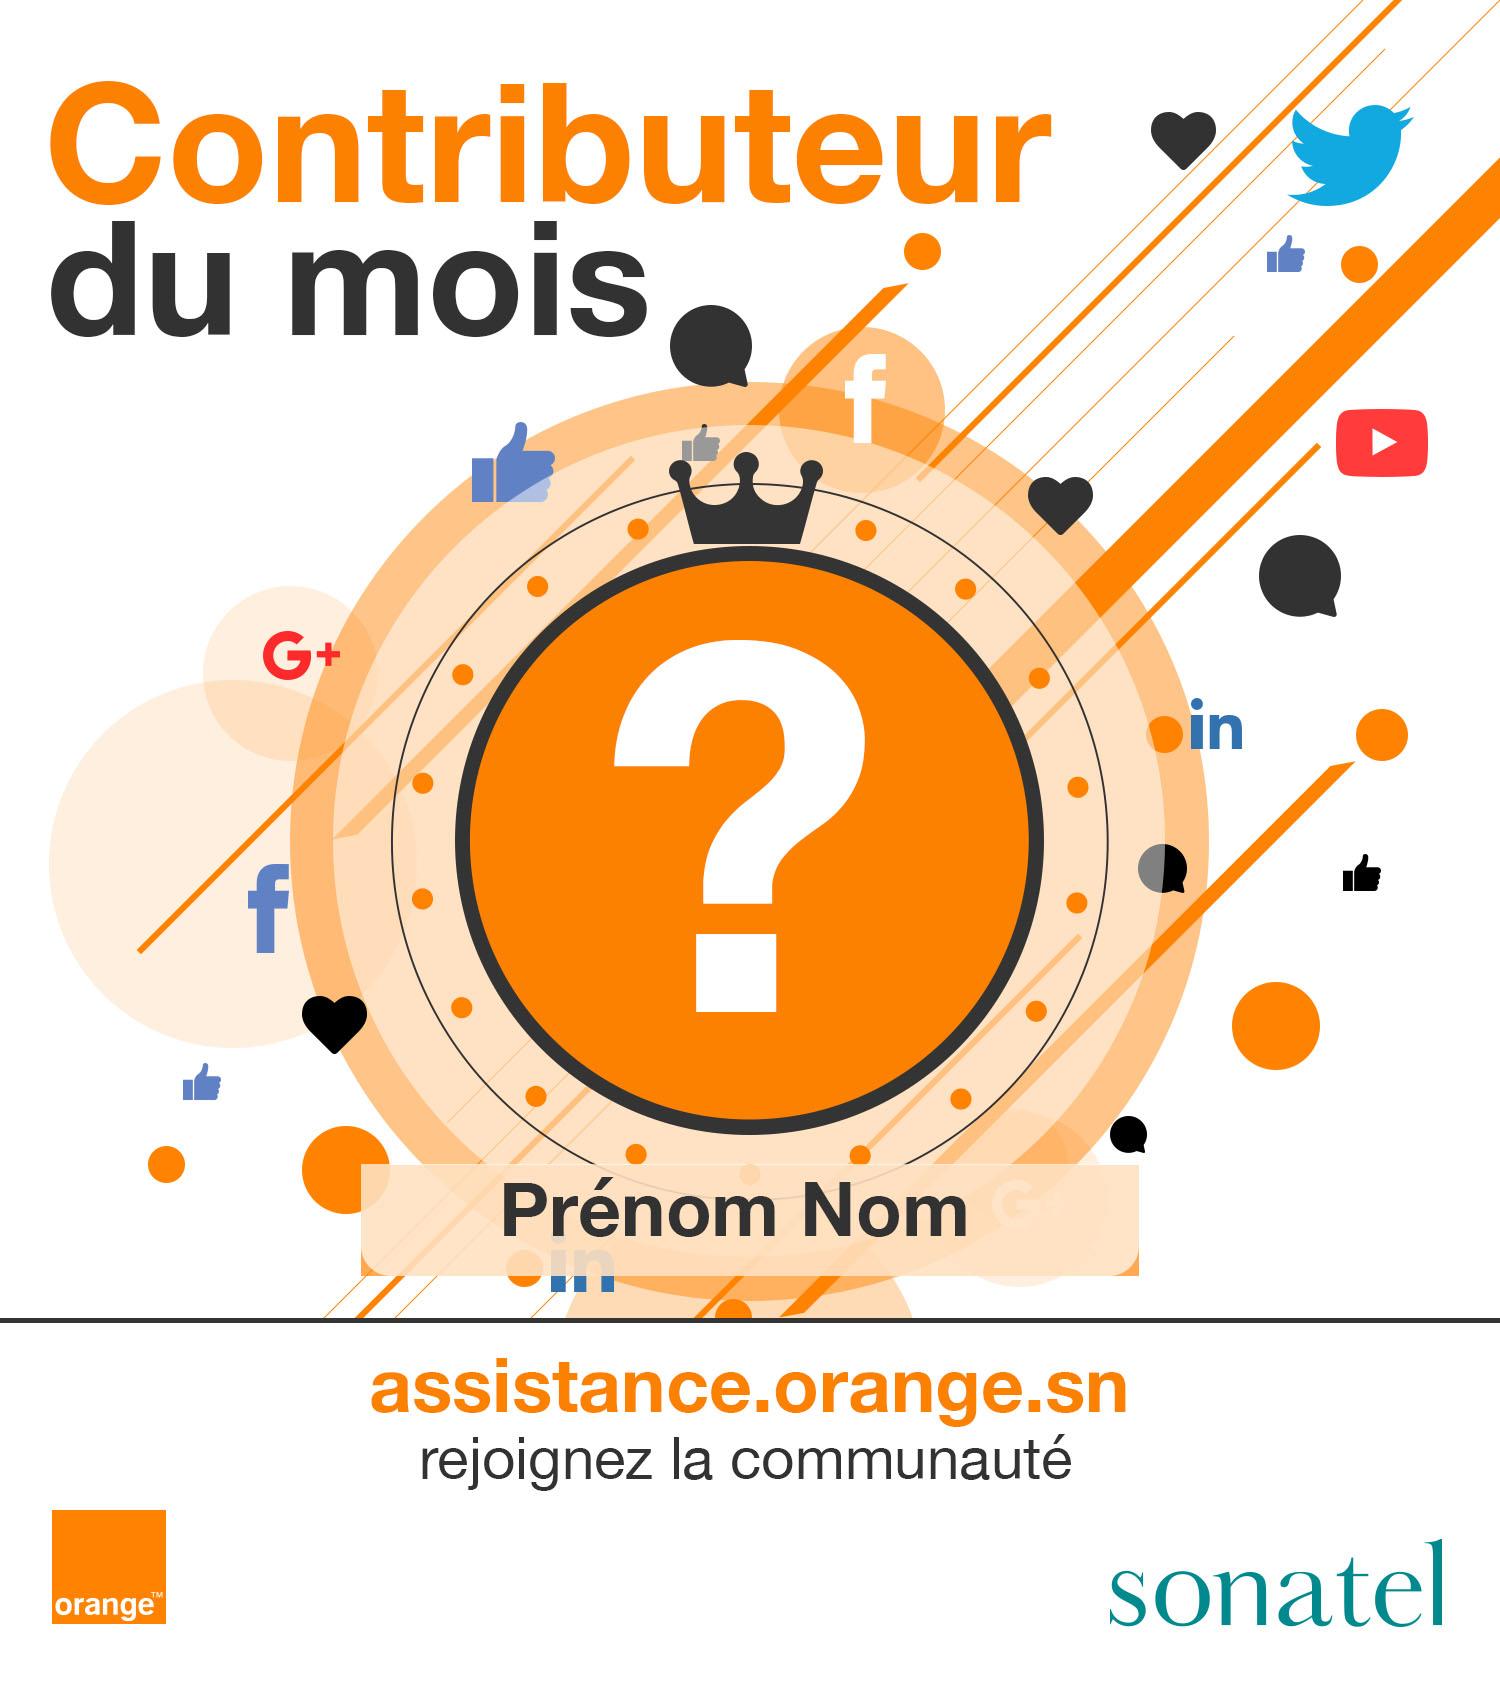 meilleur_contributeur_original.jpg